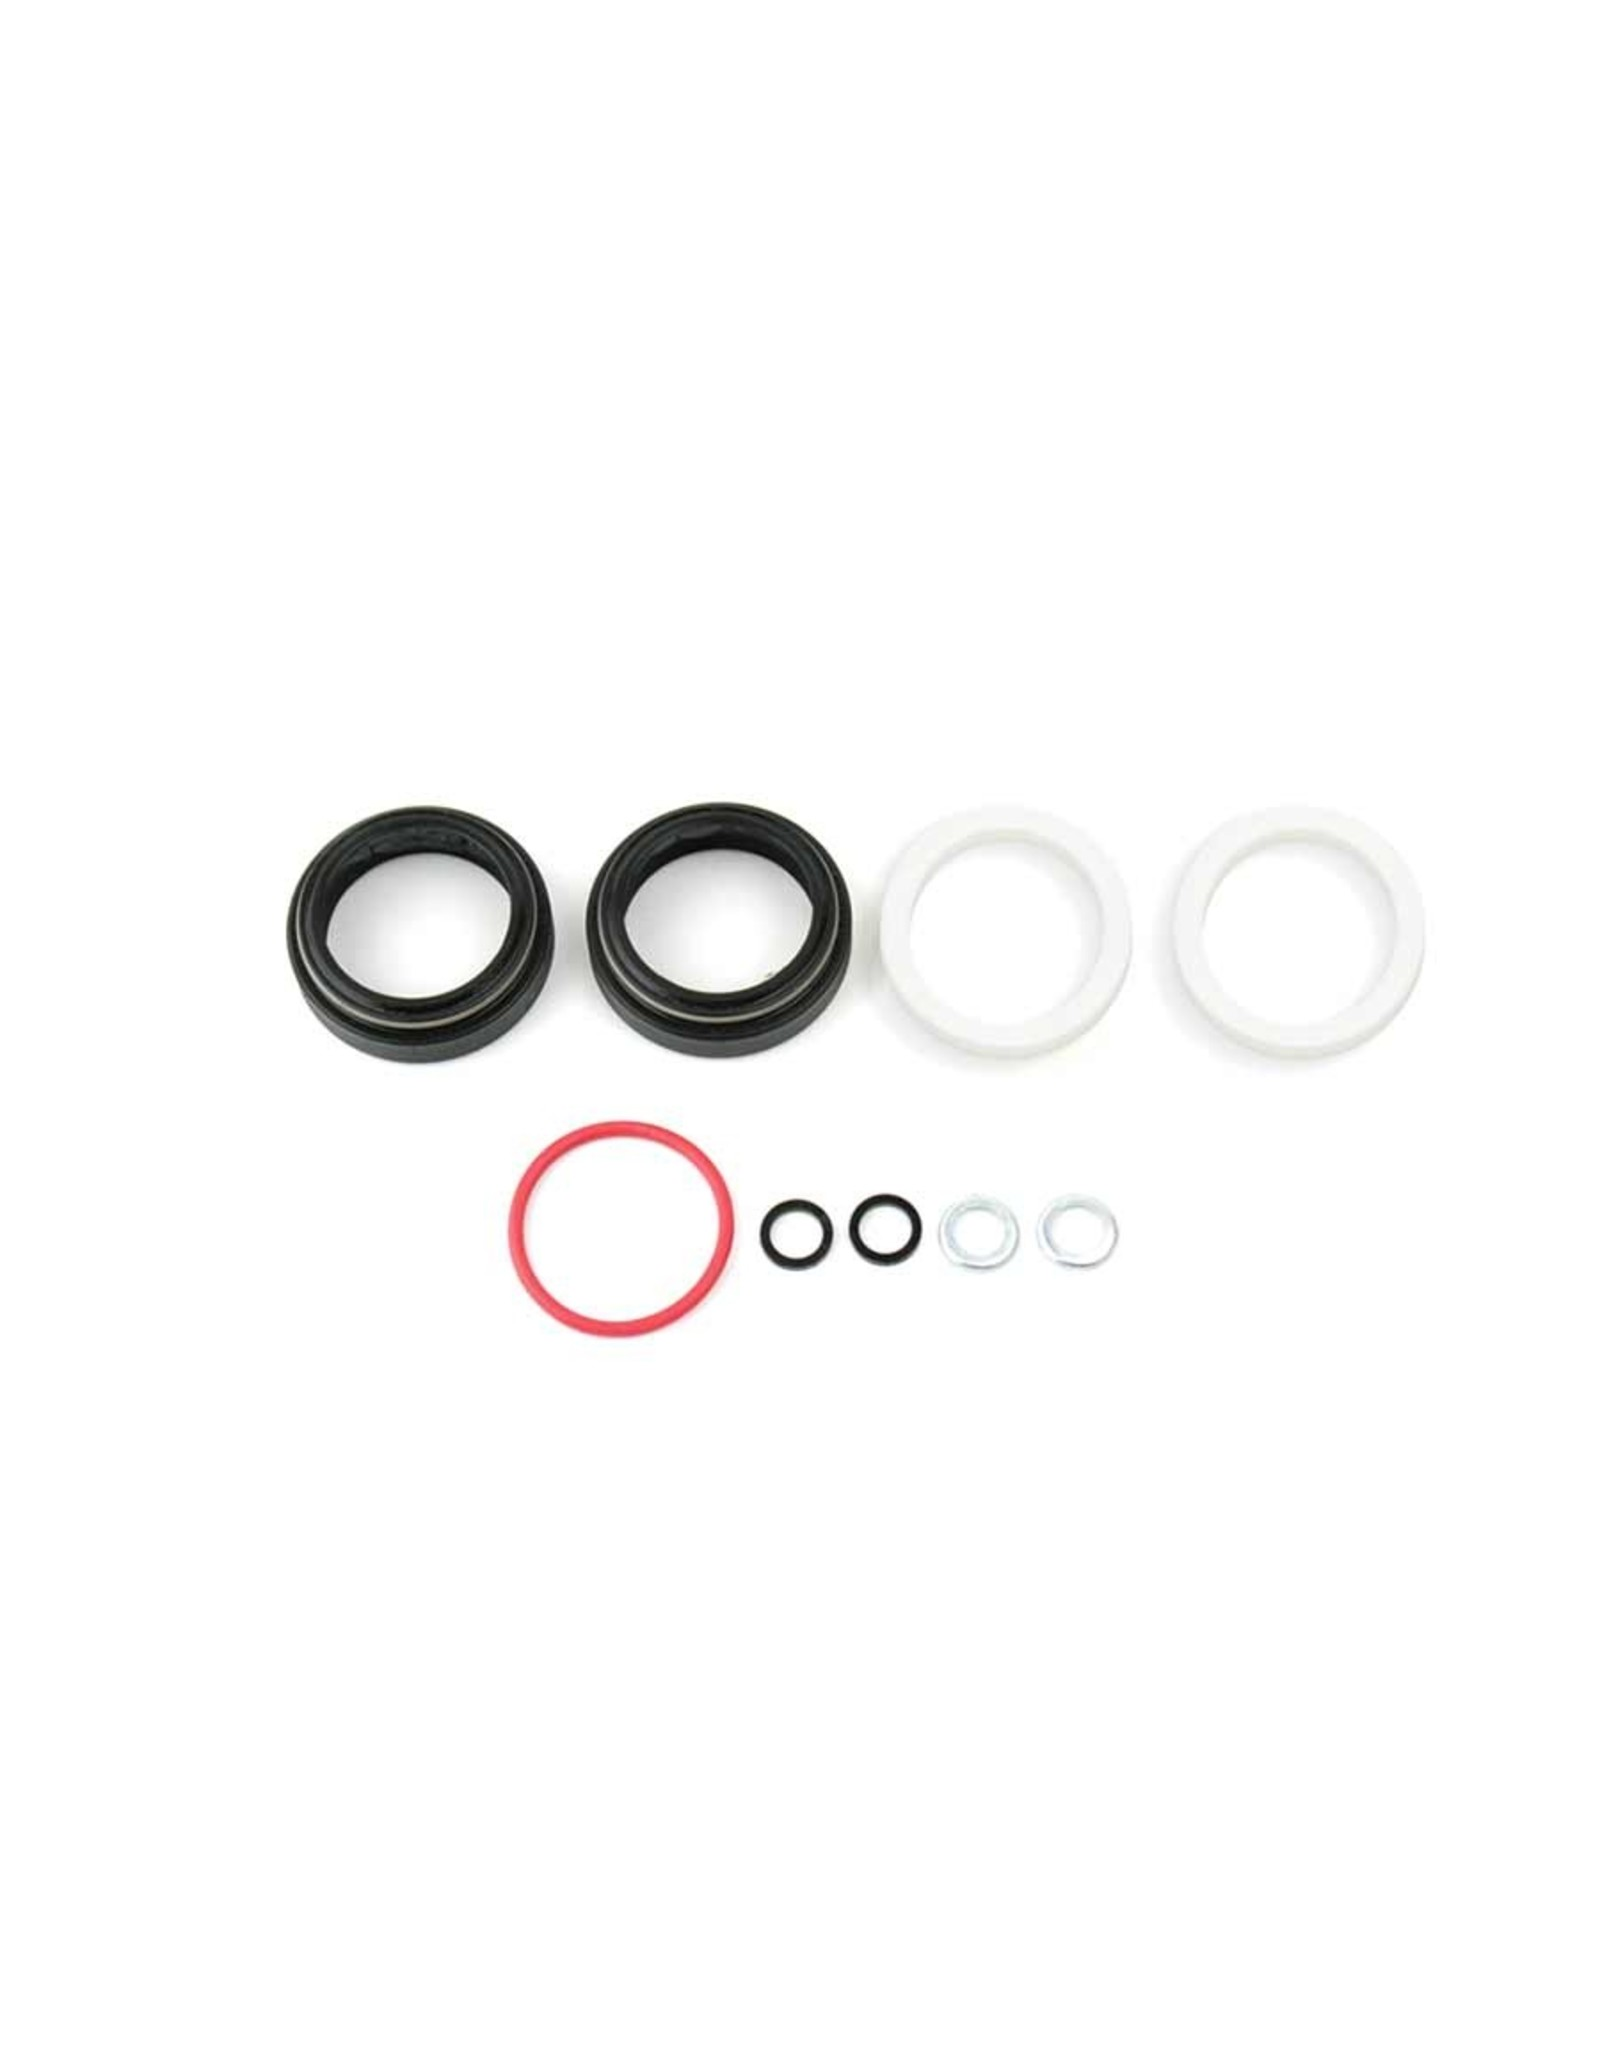 RockShox, SKF Wiper Seal Kit, 30 mm Flangeless Low Friction, Judy Silver/Judy Gold (BOOST™ FORKS), Kit